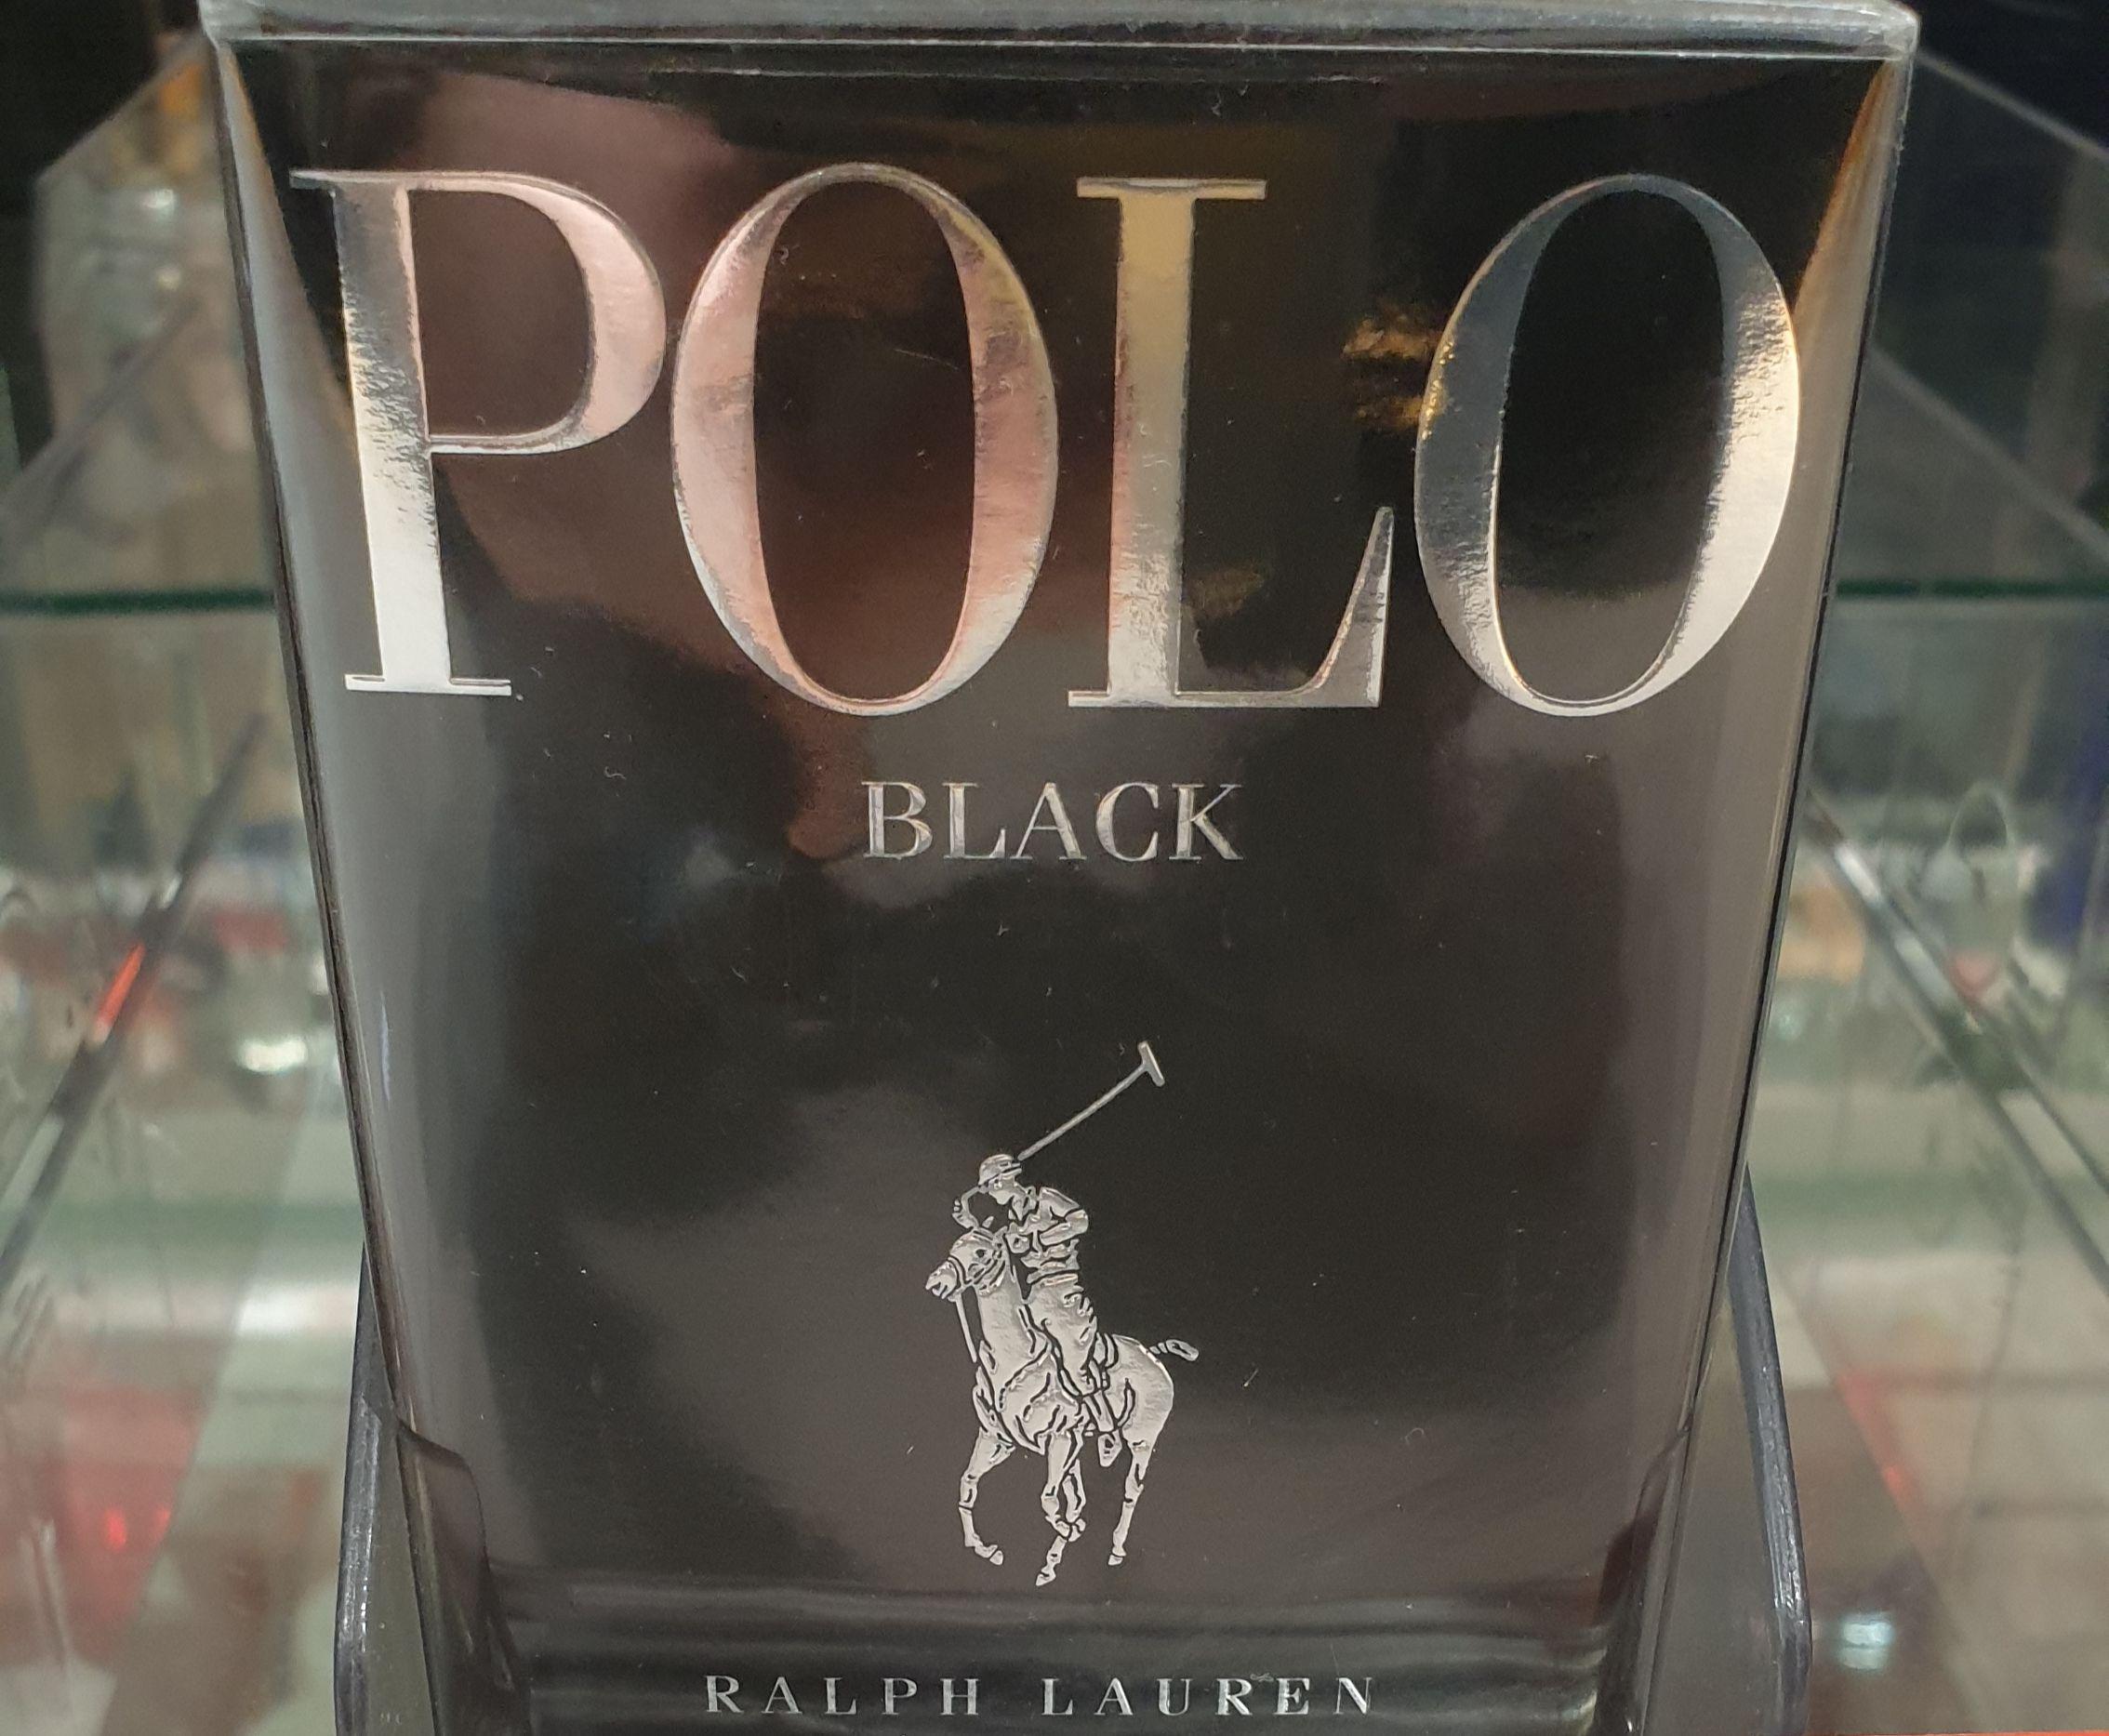 Ralph Lauren POLO BLACK hommeParfum 40ml